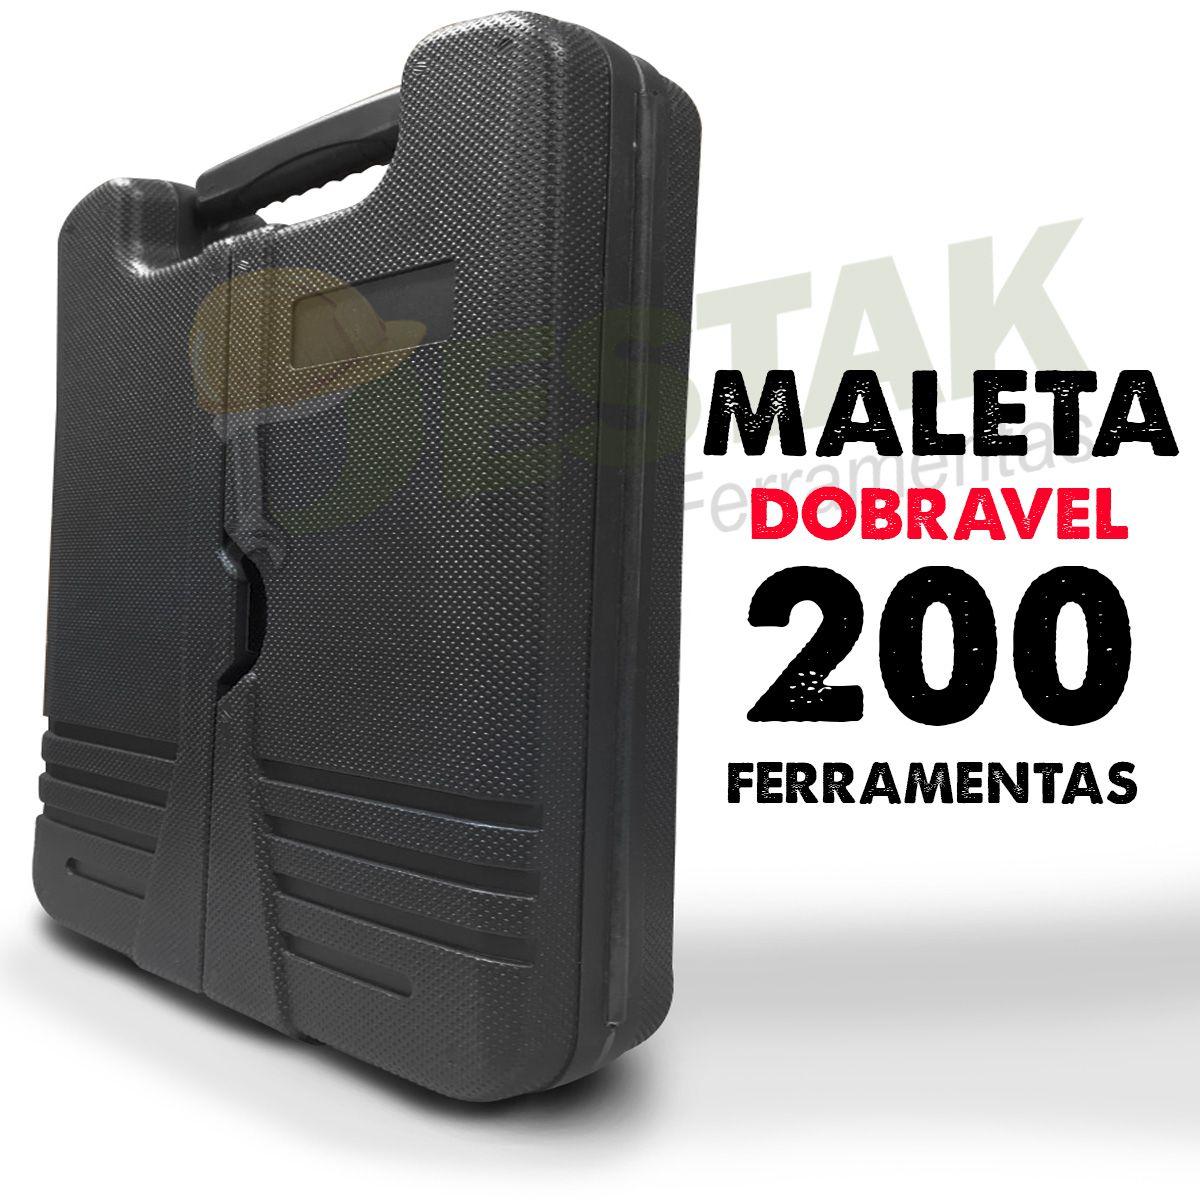 Kit Maleta Dobrável Ferramentas 200 Pçs + Pulseira Especial